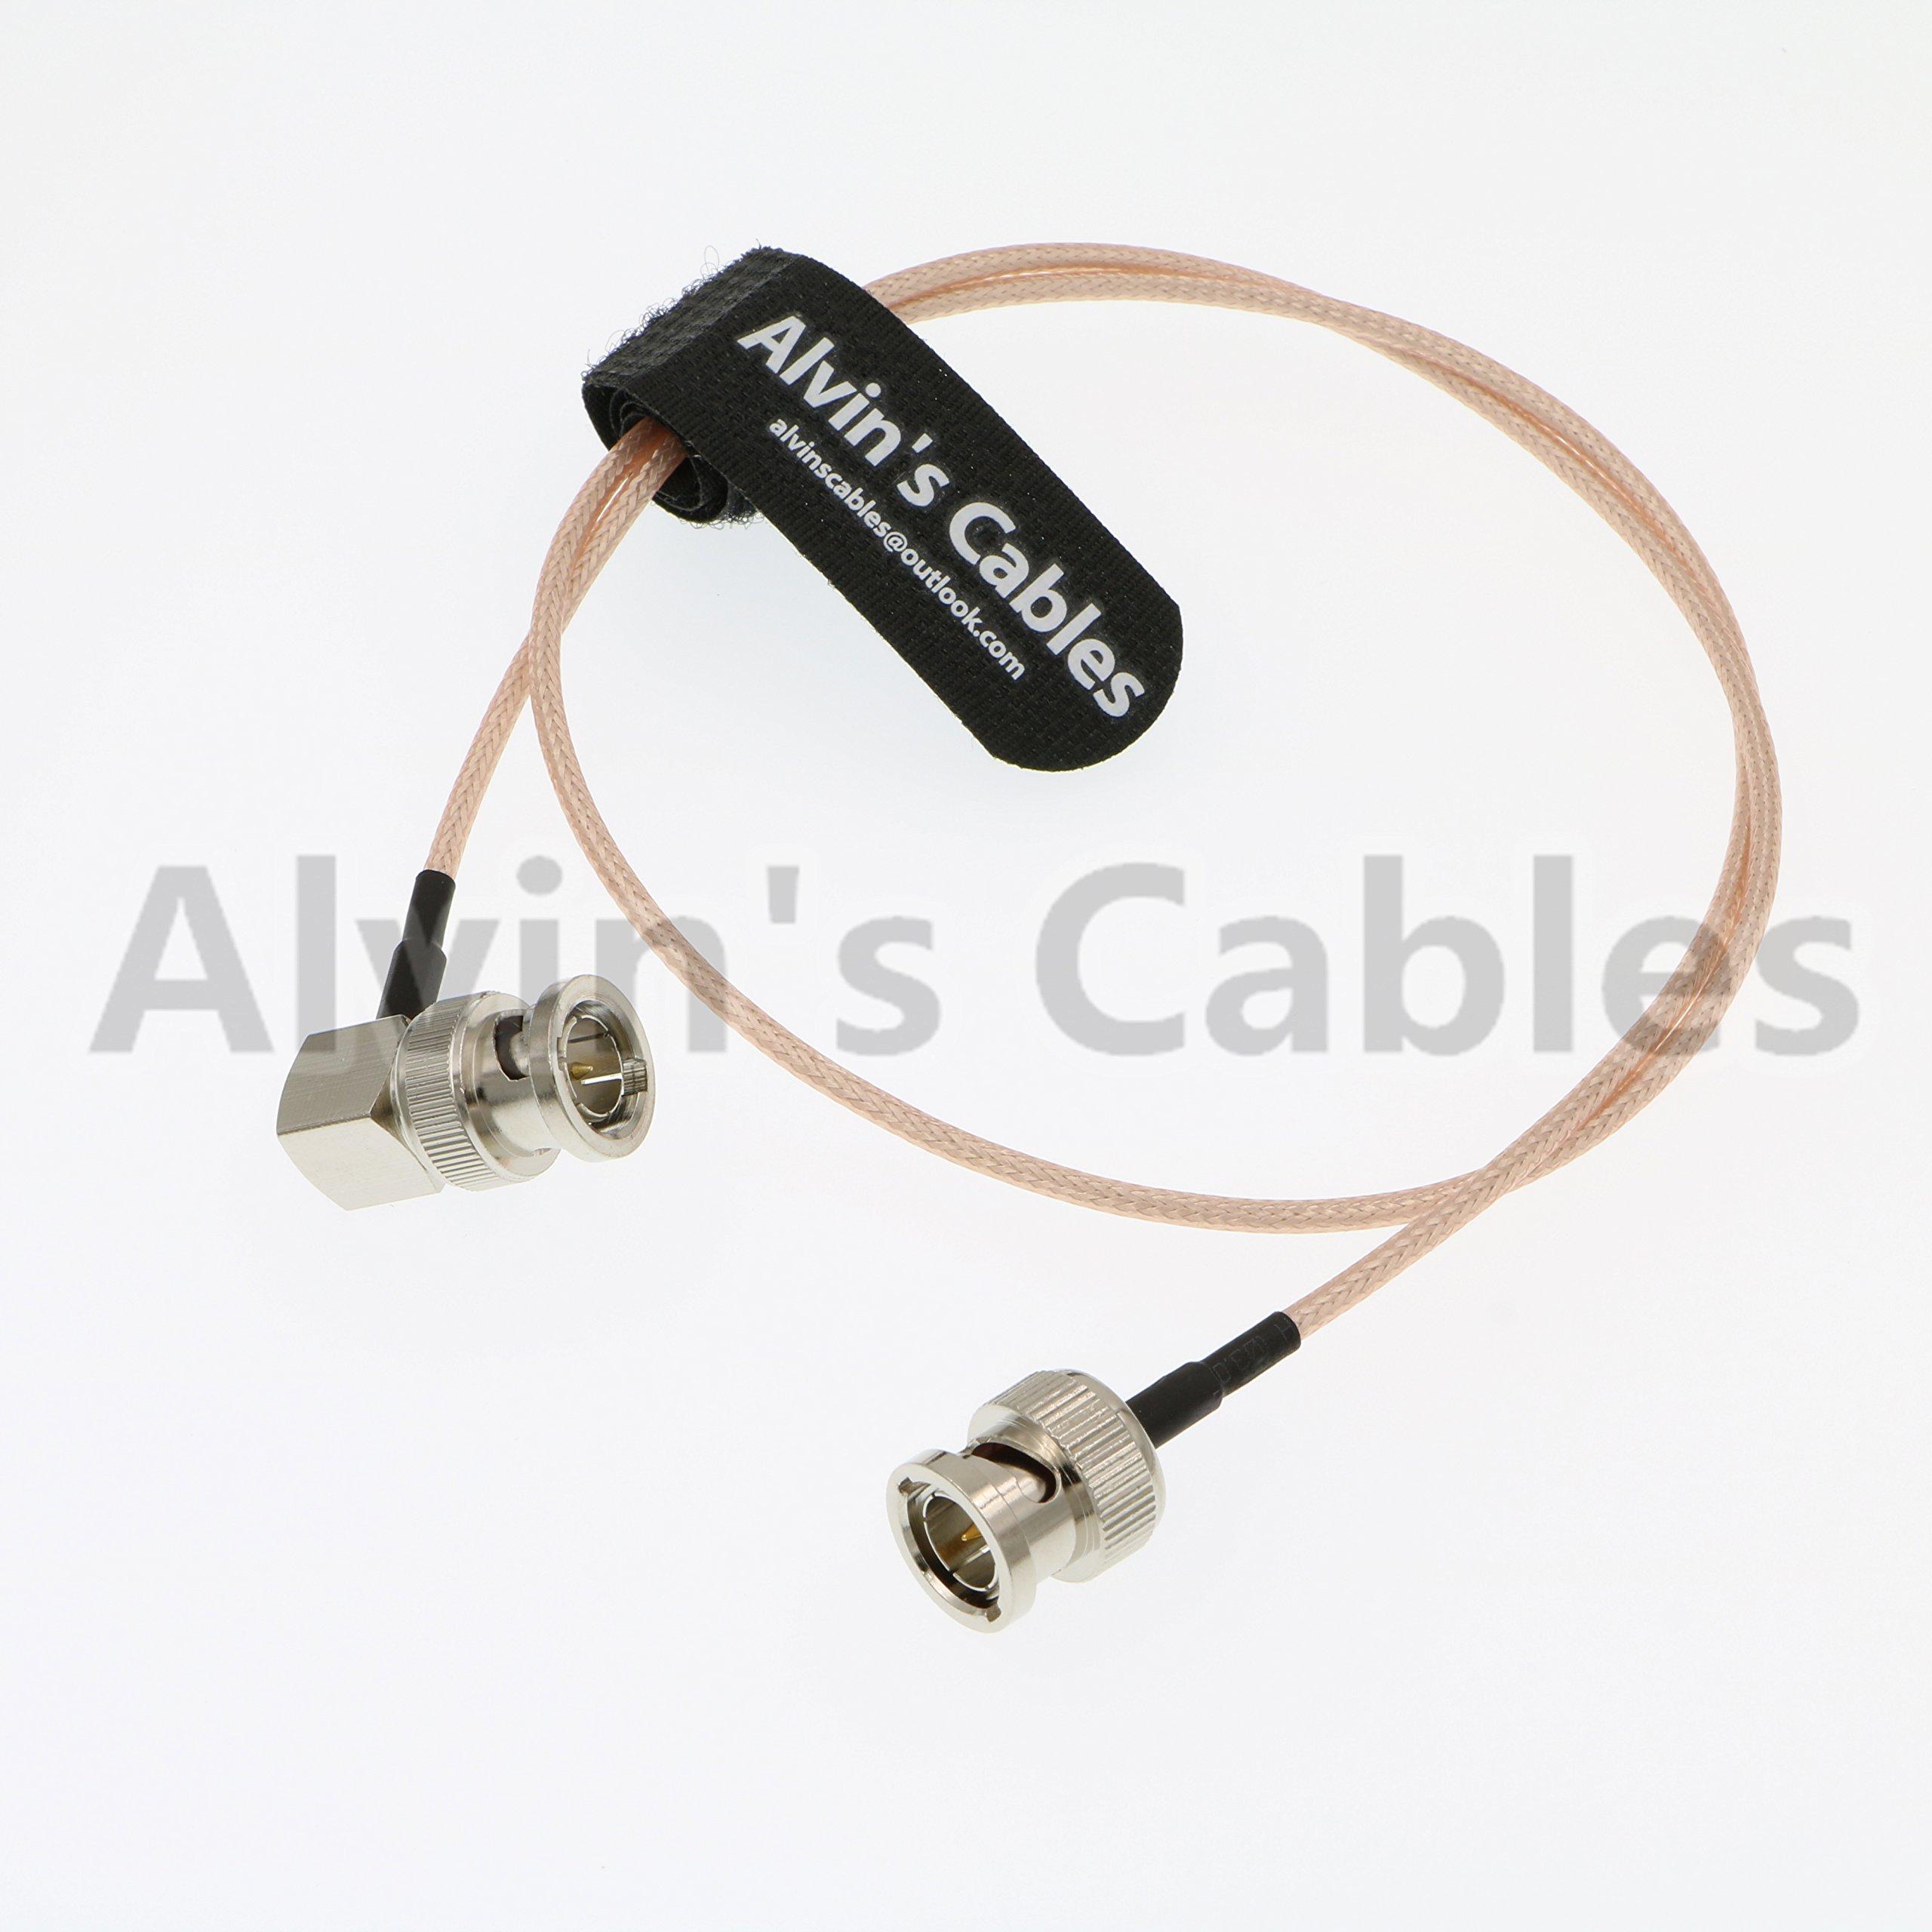 Blackmagic RG179 Coax BNC Right Angle Male to Male Cable for BMCC Video Camera